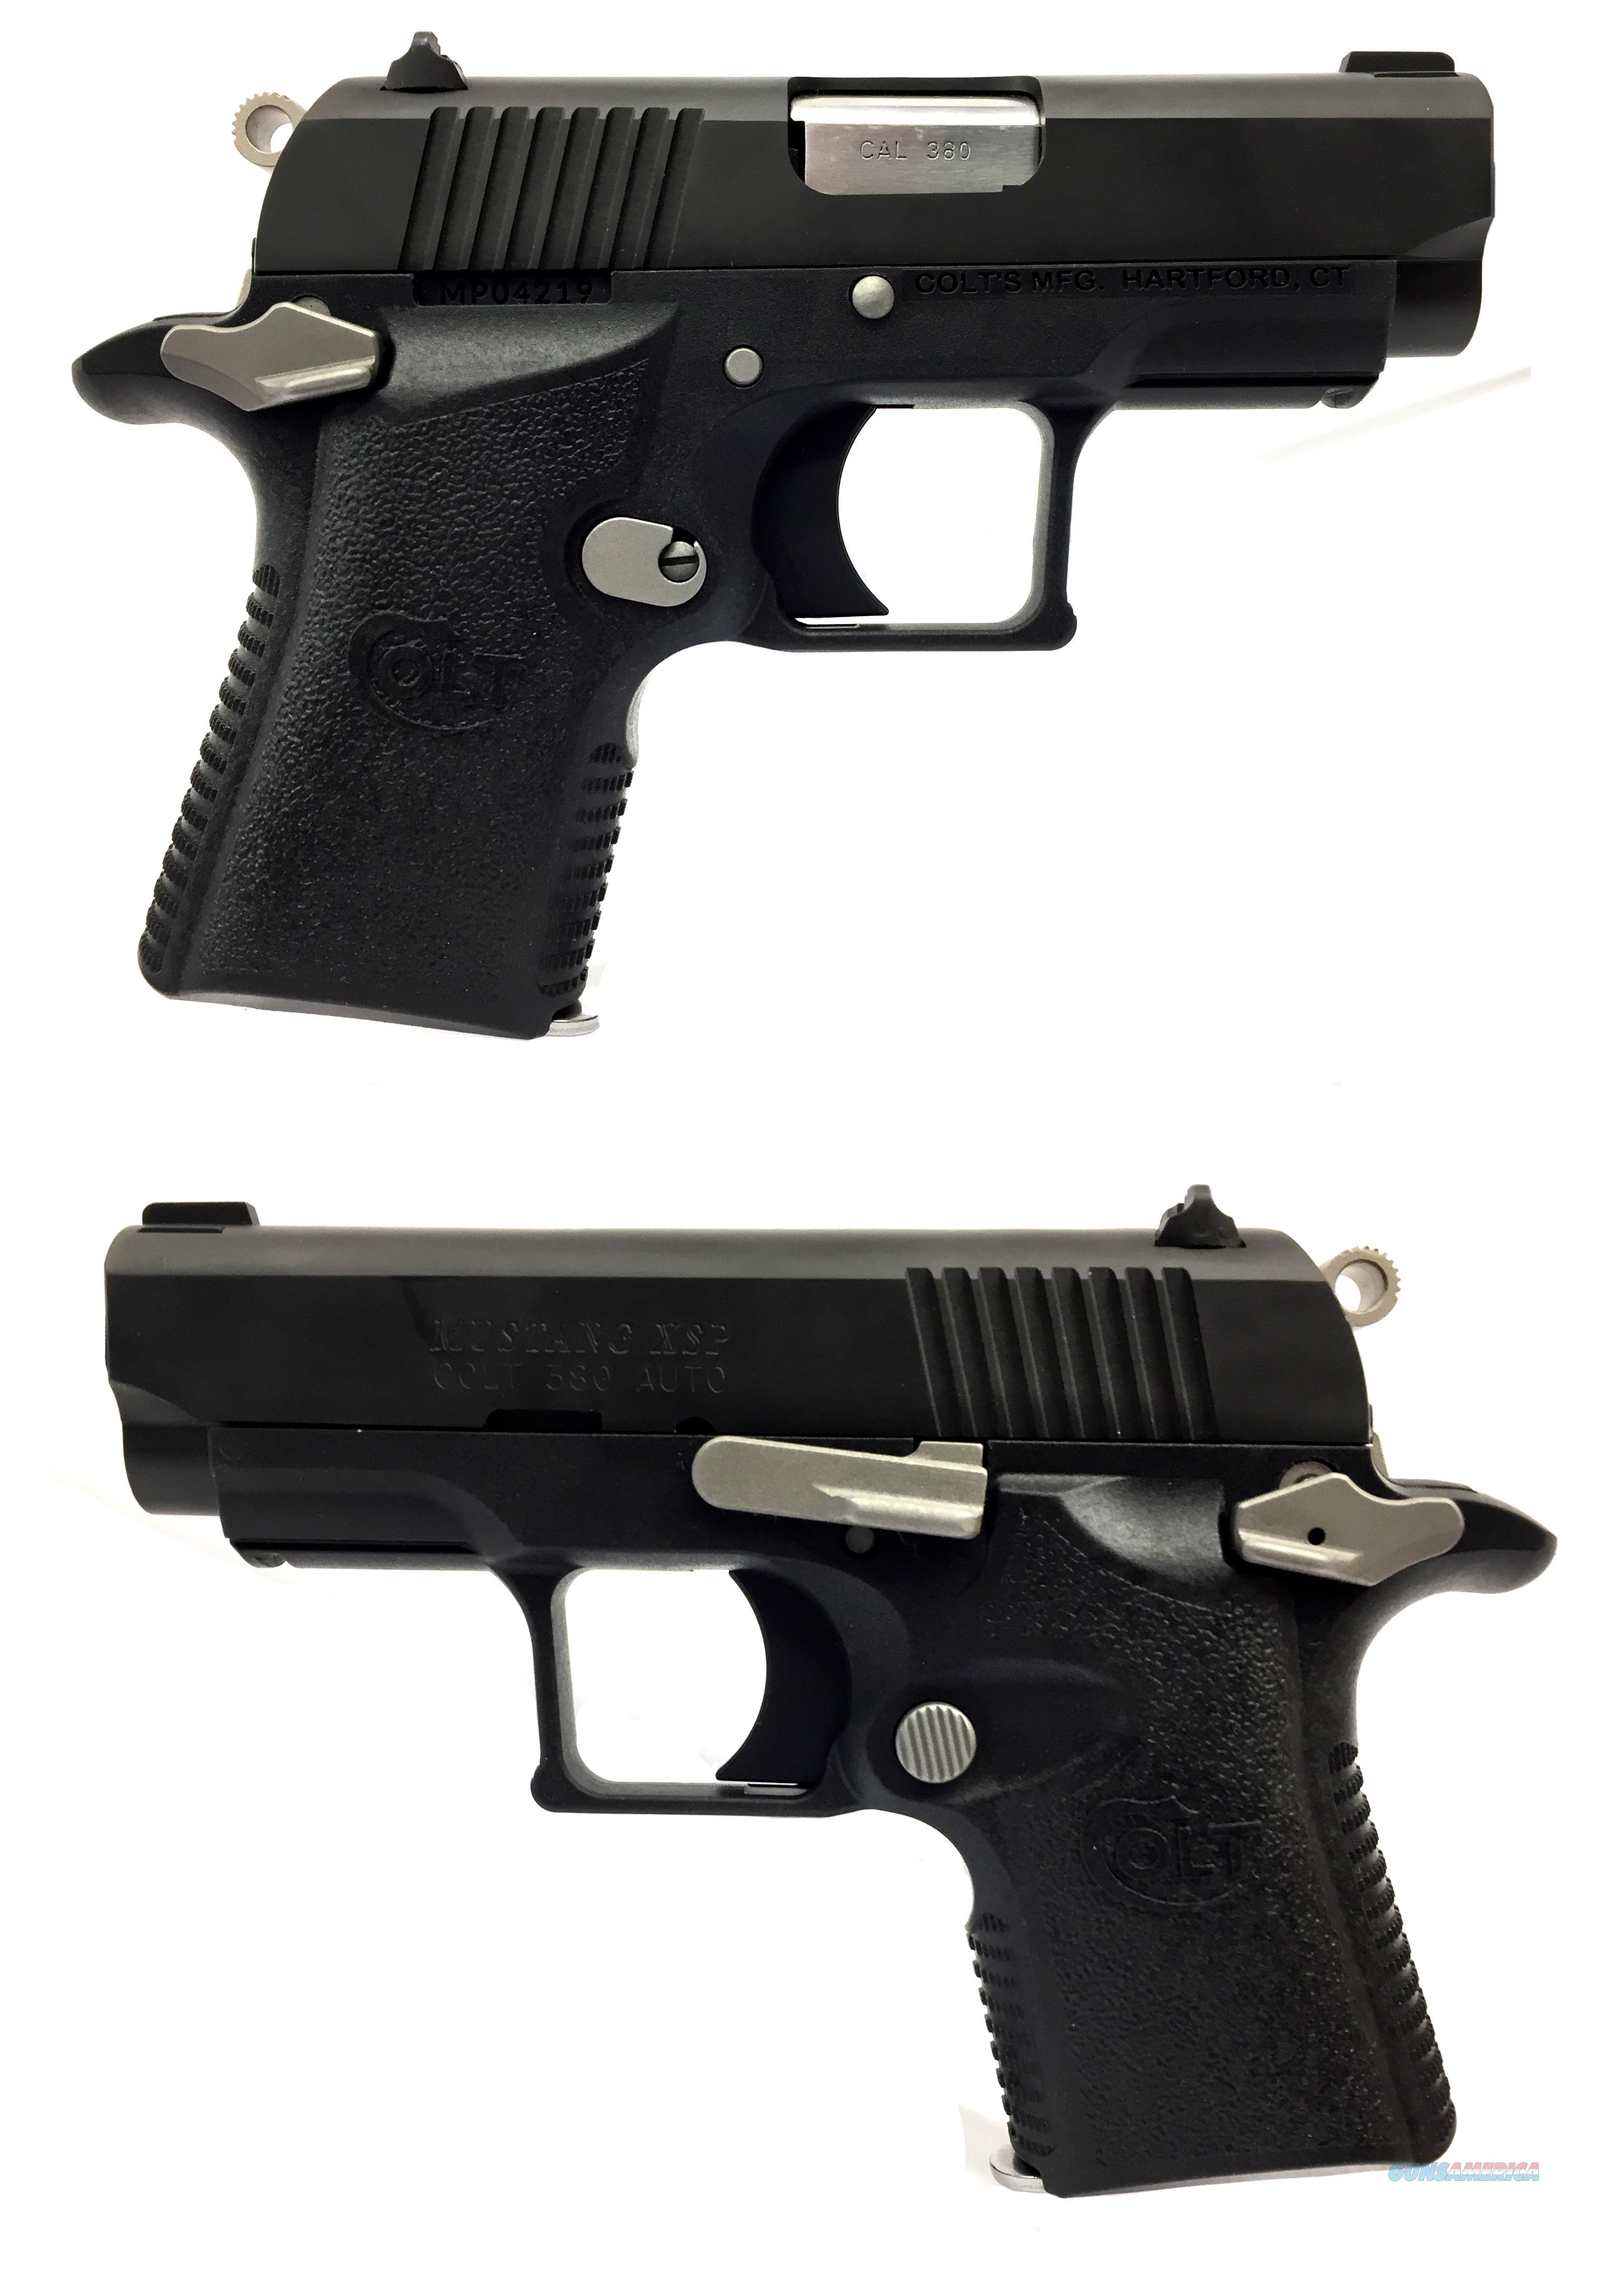 Colt Mustang XSP .380ACP Semi-Automatic Pistol  Guns > Pistols > Colt Automatic Pistols (.25, .32, & .380 cal)